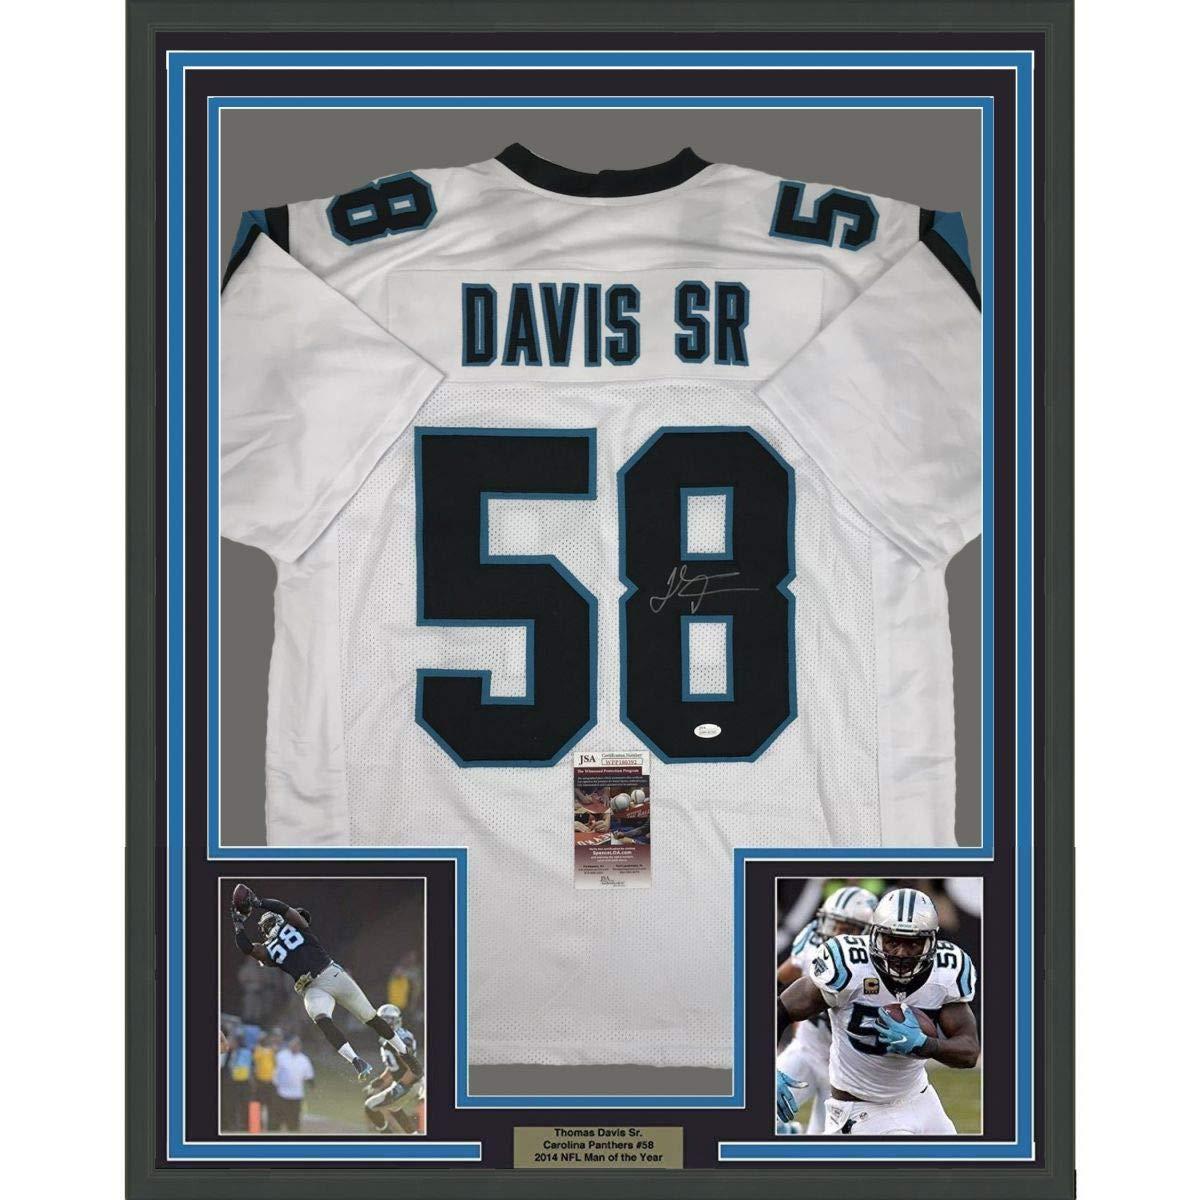 f6f8409c Framed Autographed/Signed Thomas Davis Sr. 33x42 Carolina White Football  Jersey JSA COA at Amazon's Sports Collectibles Store